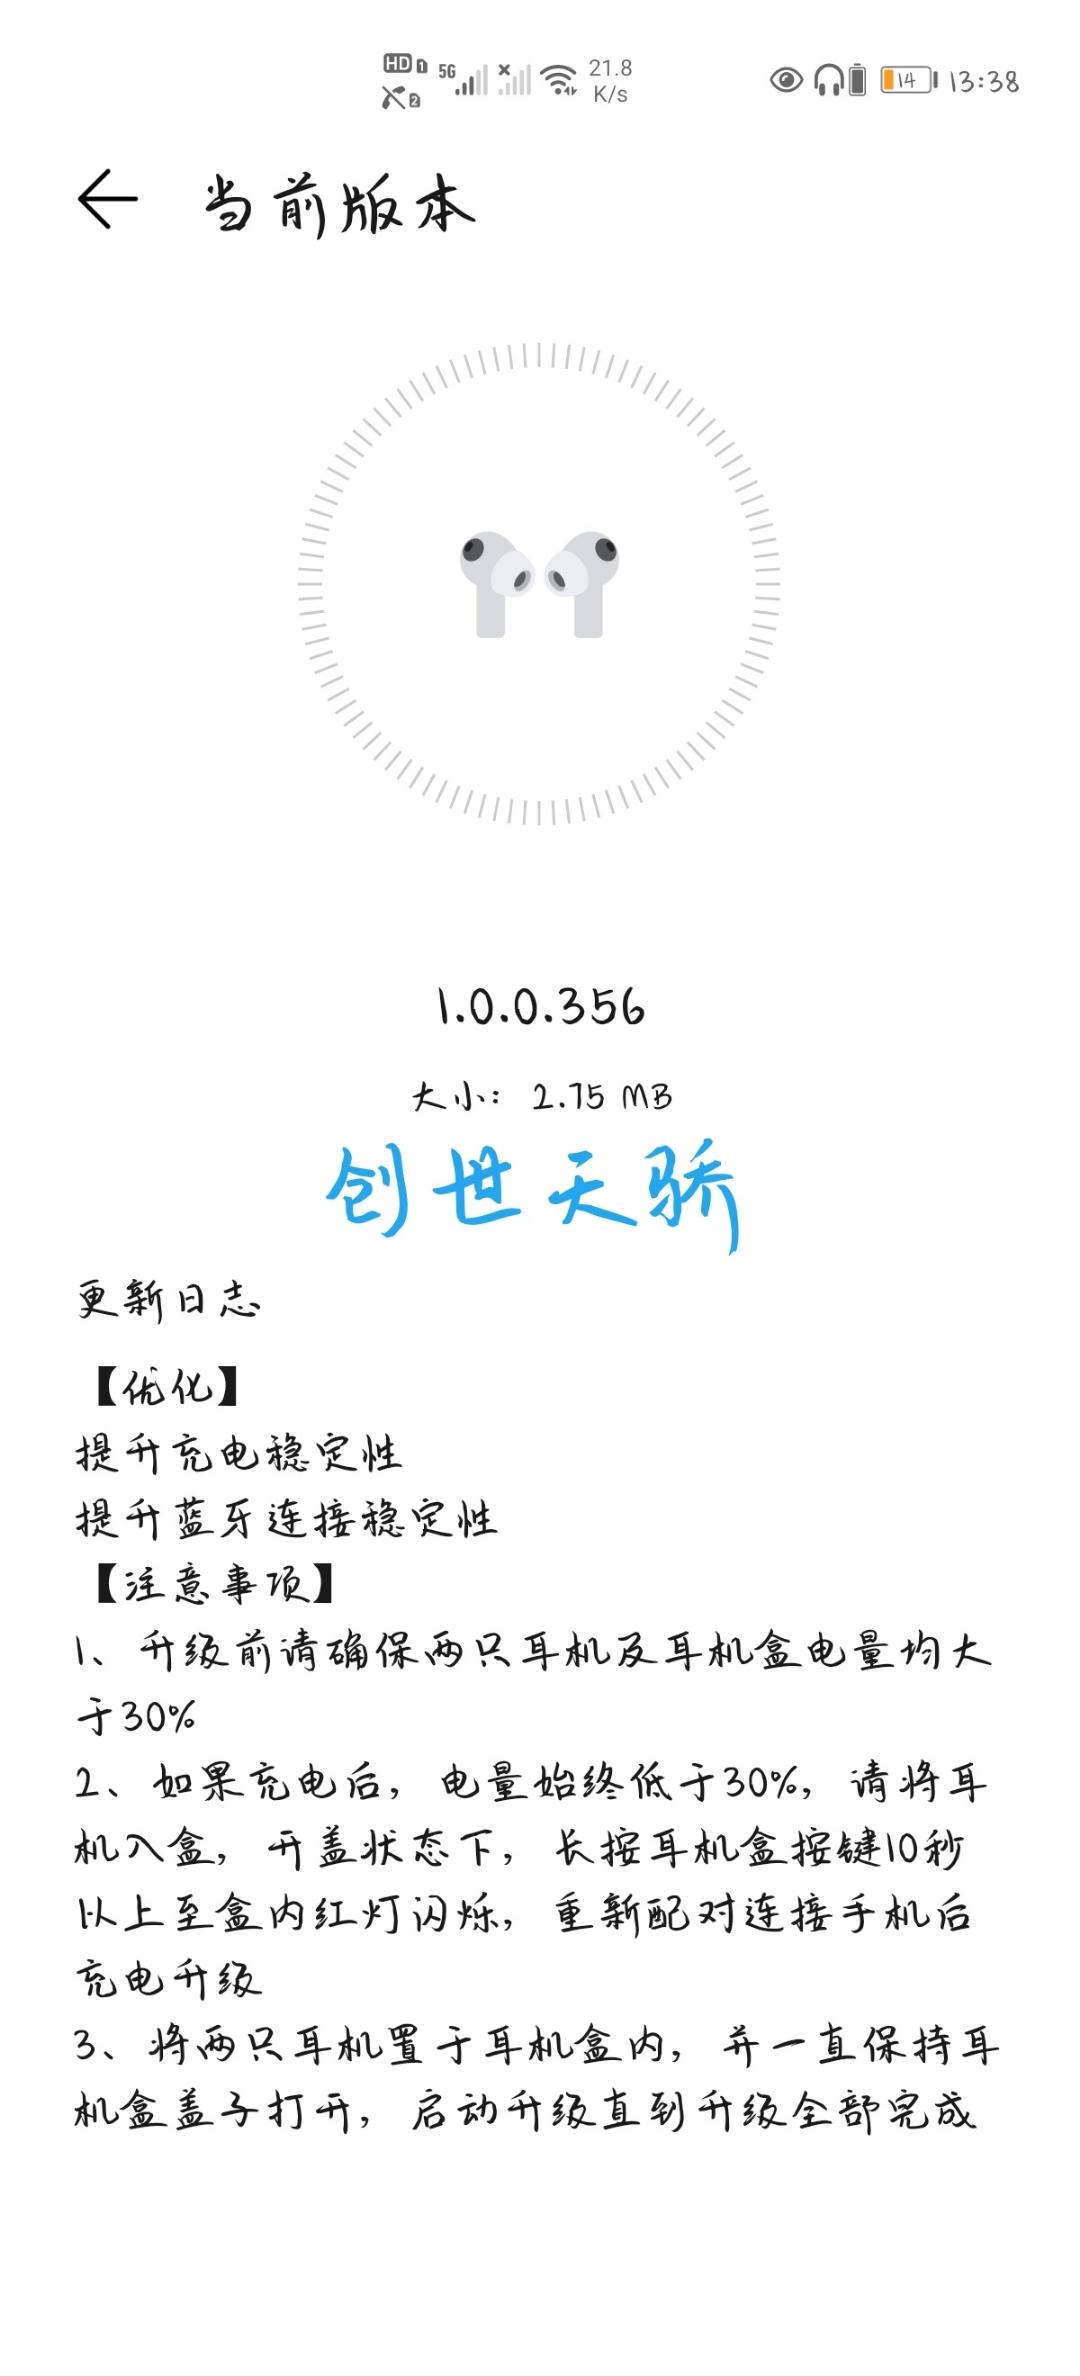 Screenshot_20210329_133832_com.huawei.smarthome_edit_446664693682363.jpg